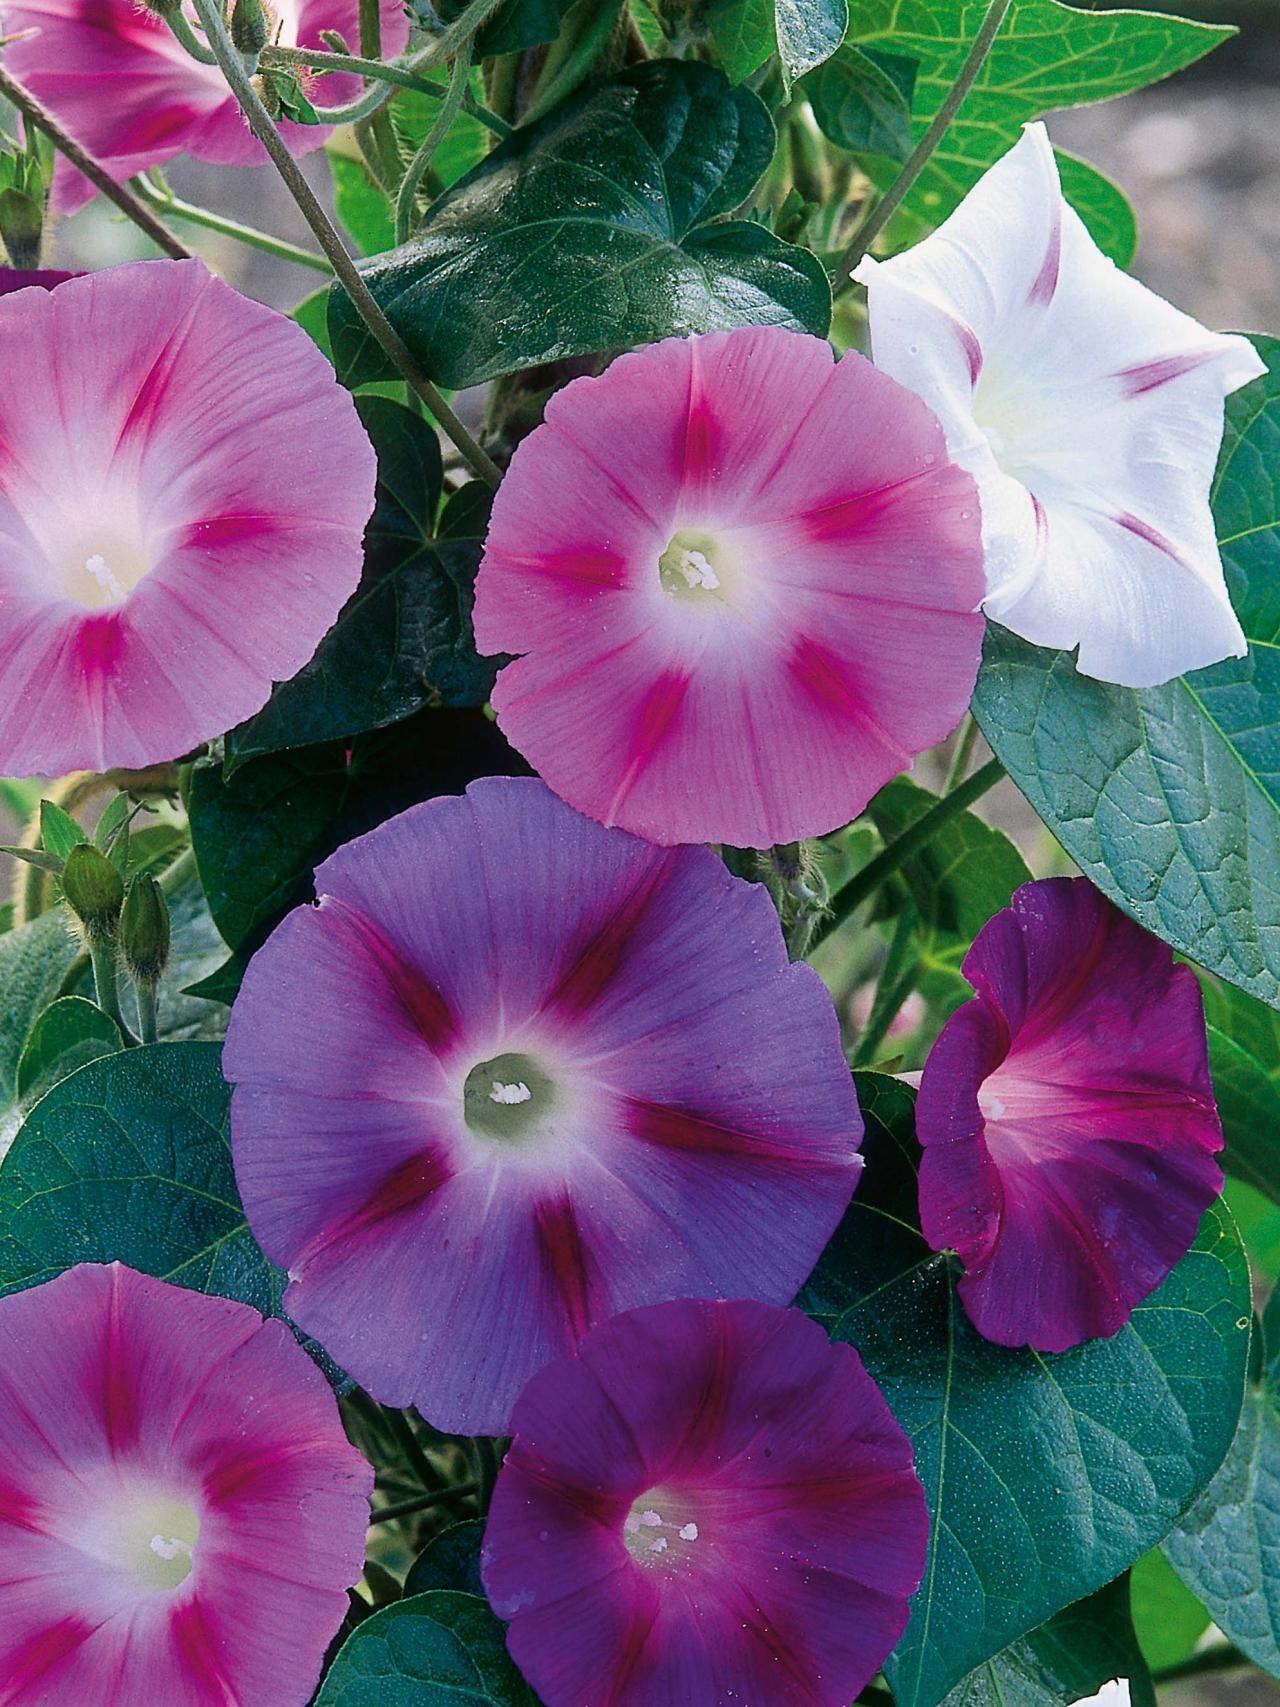 15 Annuals For Cut Flowers Vrt Pinterest Gardens Cut Flowers